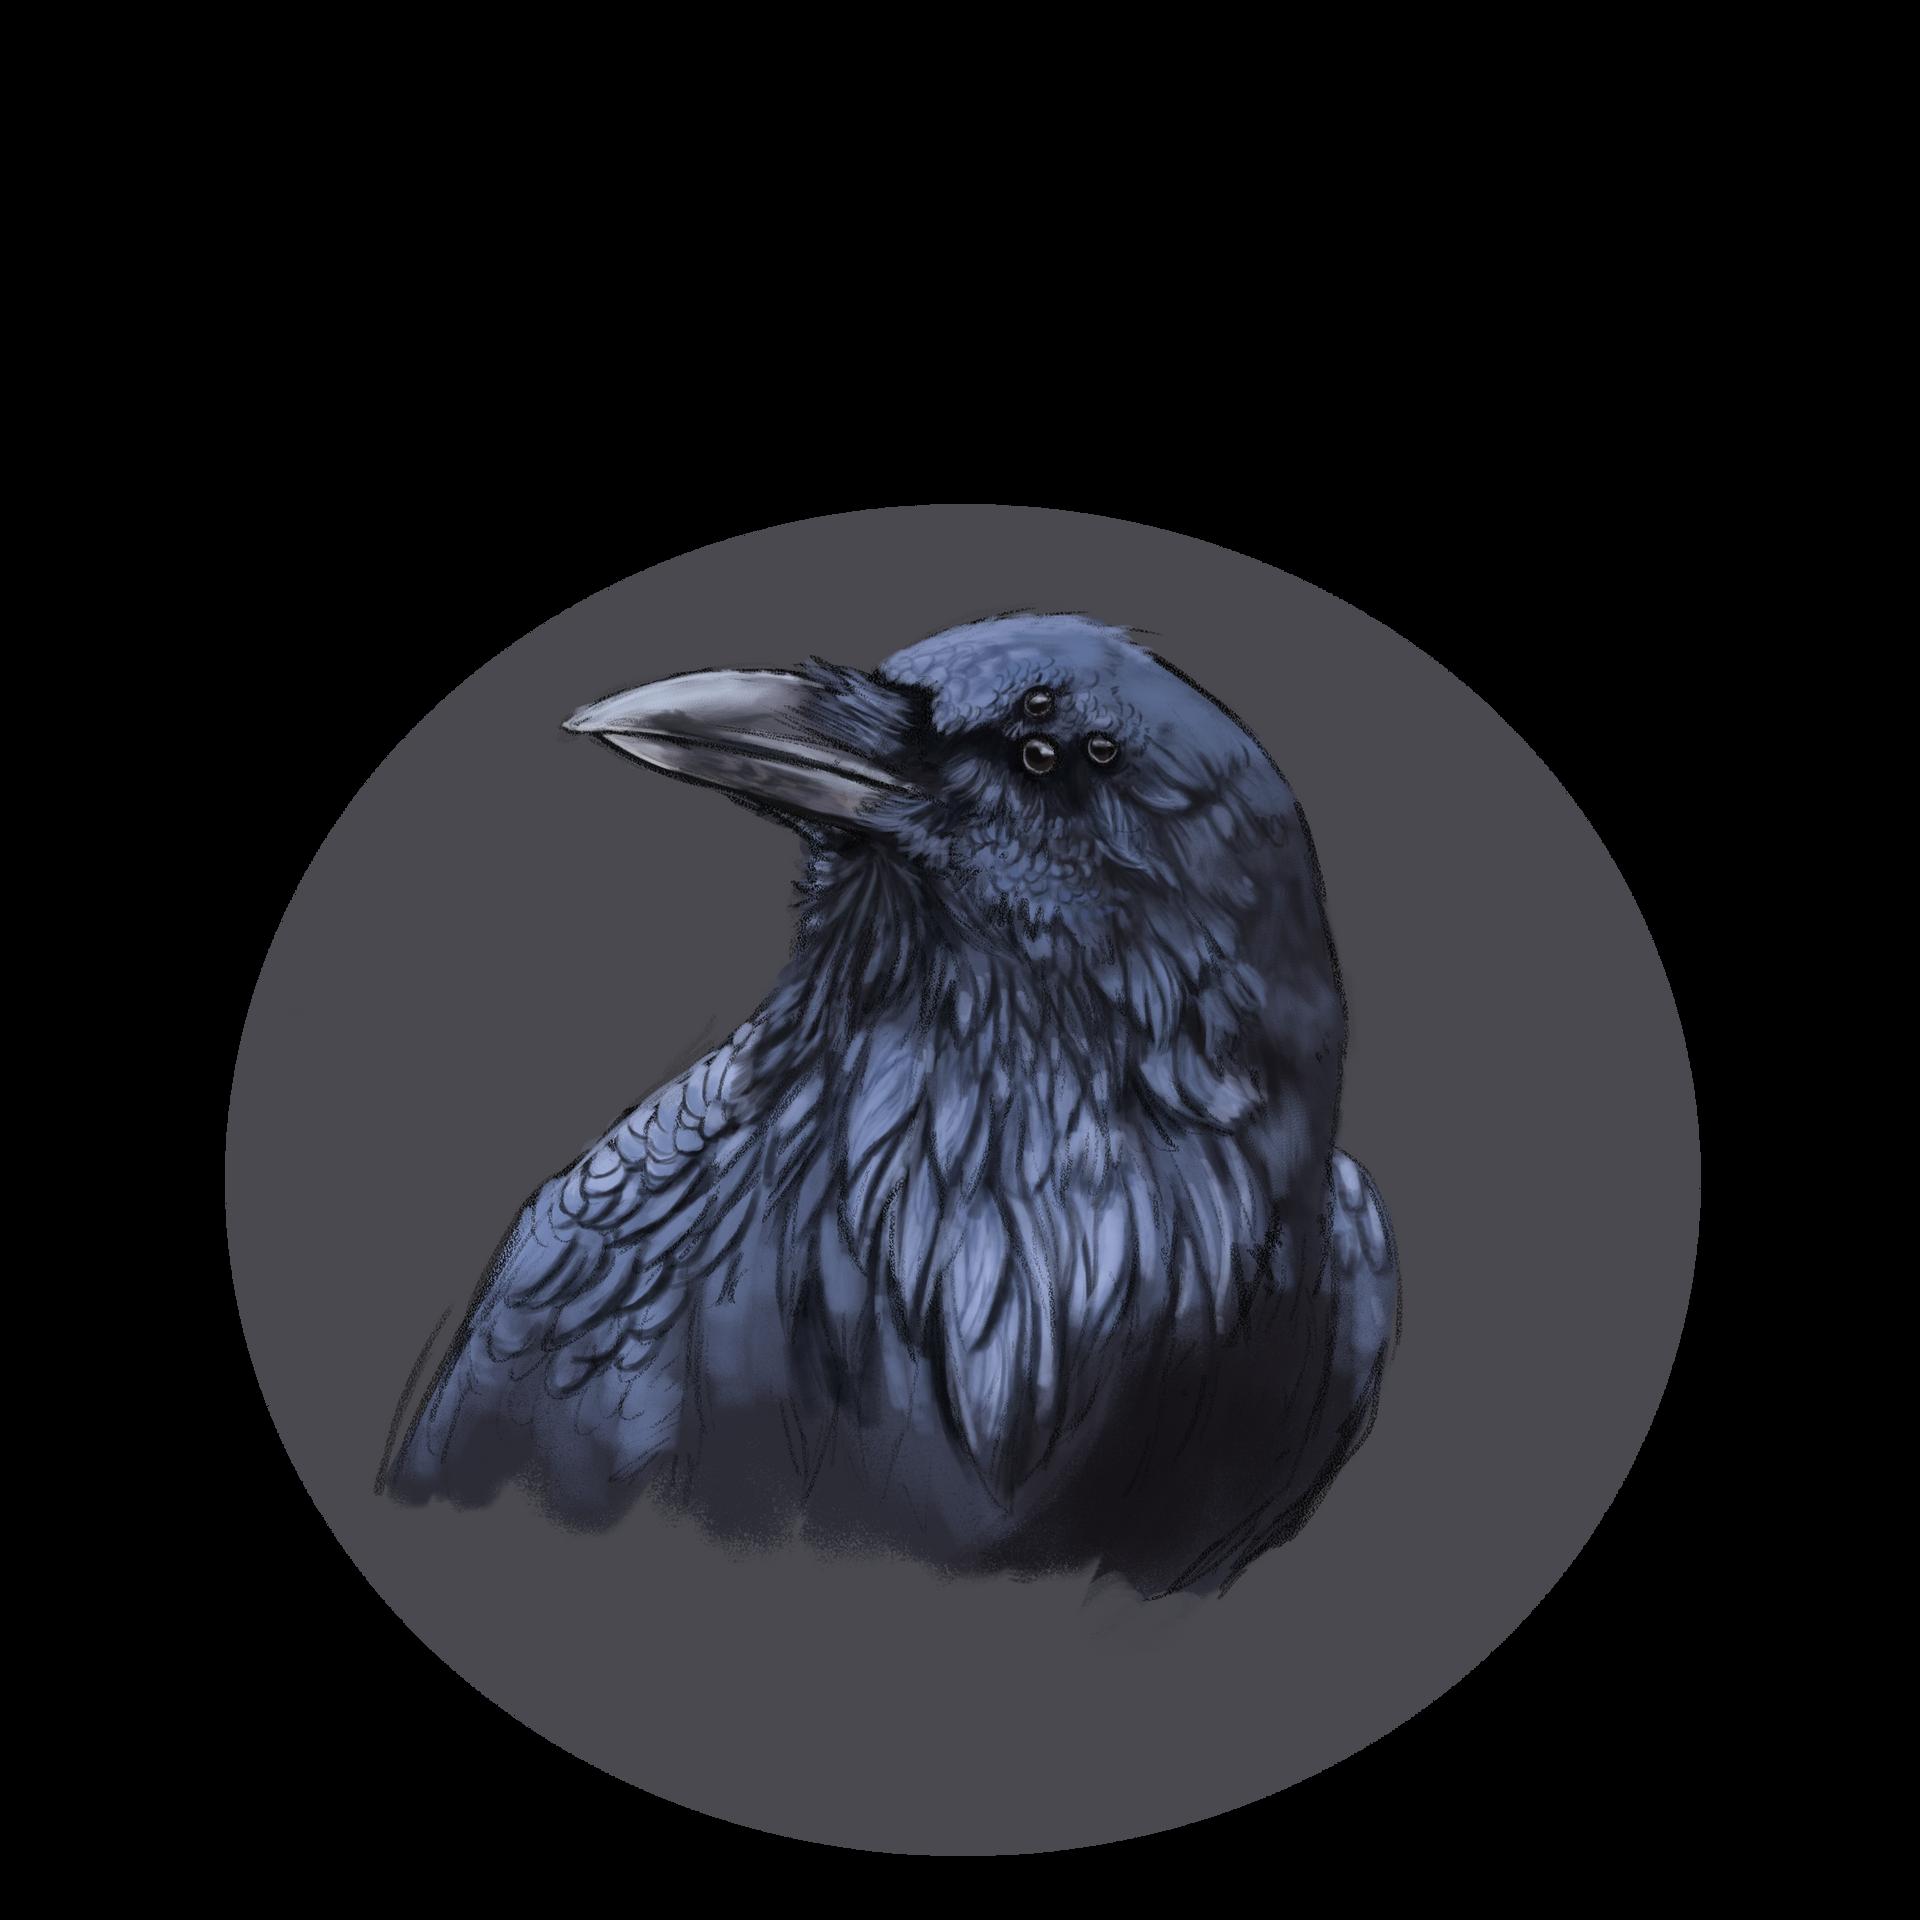 3 eyed raven